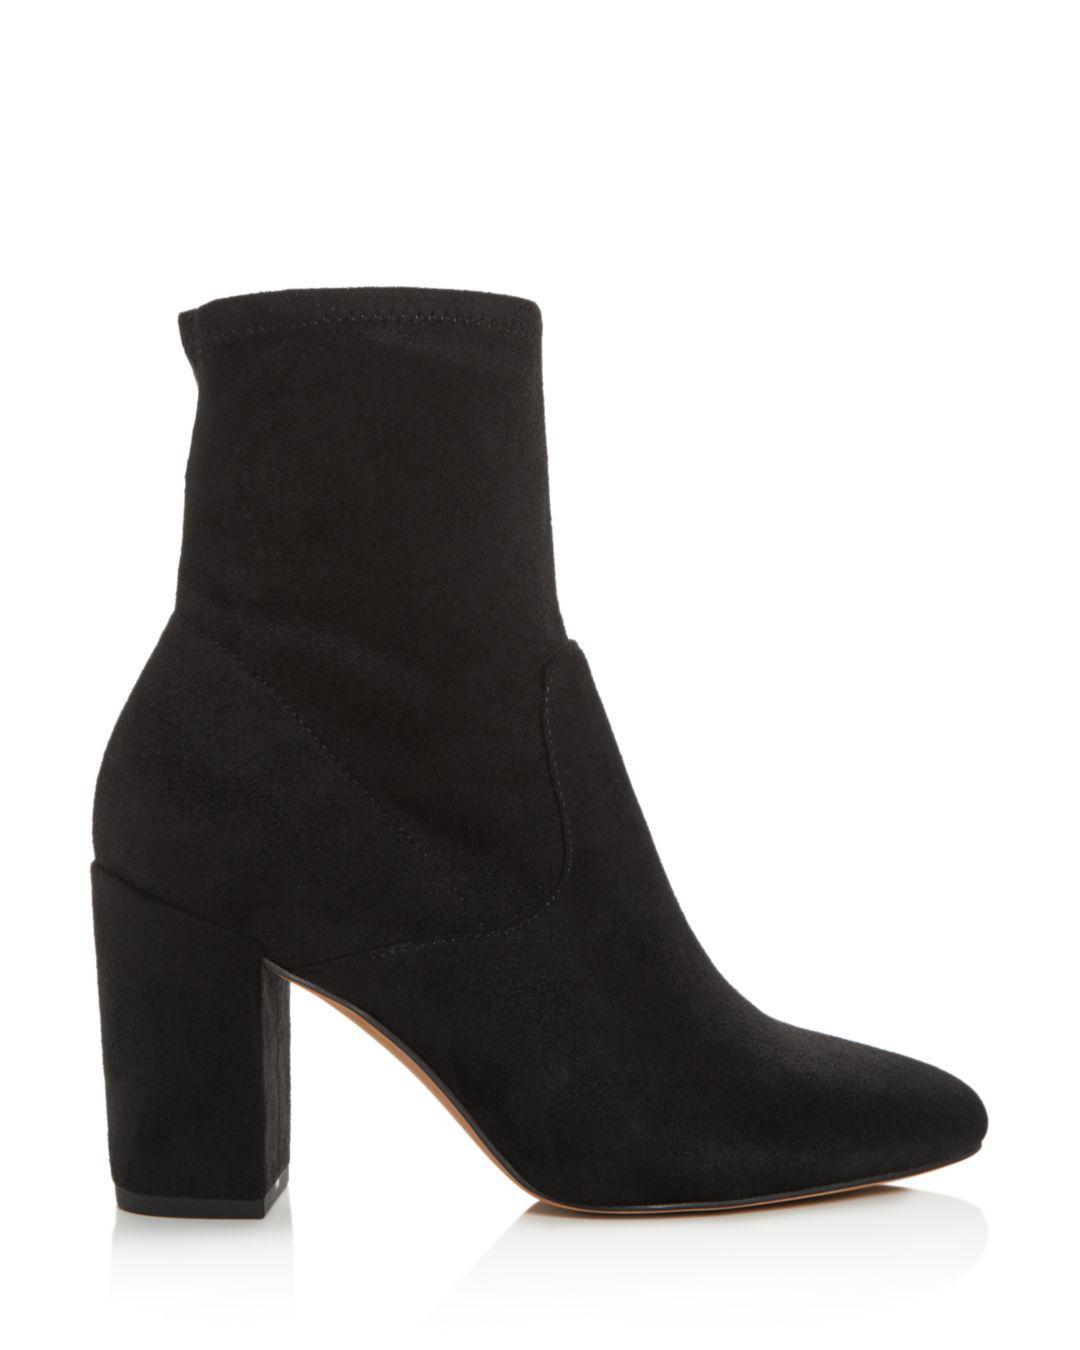 a0054602aae Lyst - Rebecca Minkoff Women s Gianella High Block-heel Booties in Black